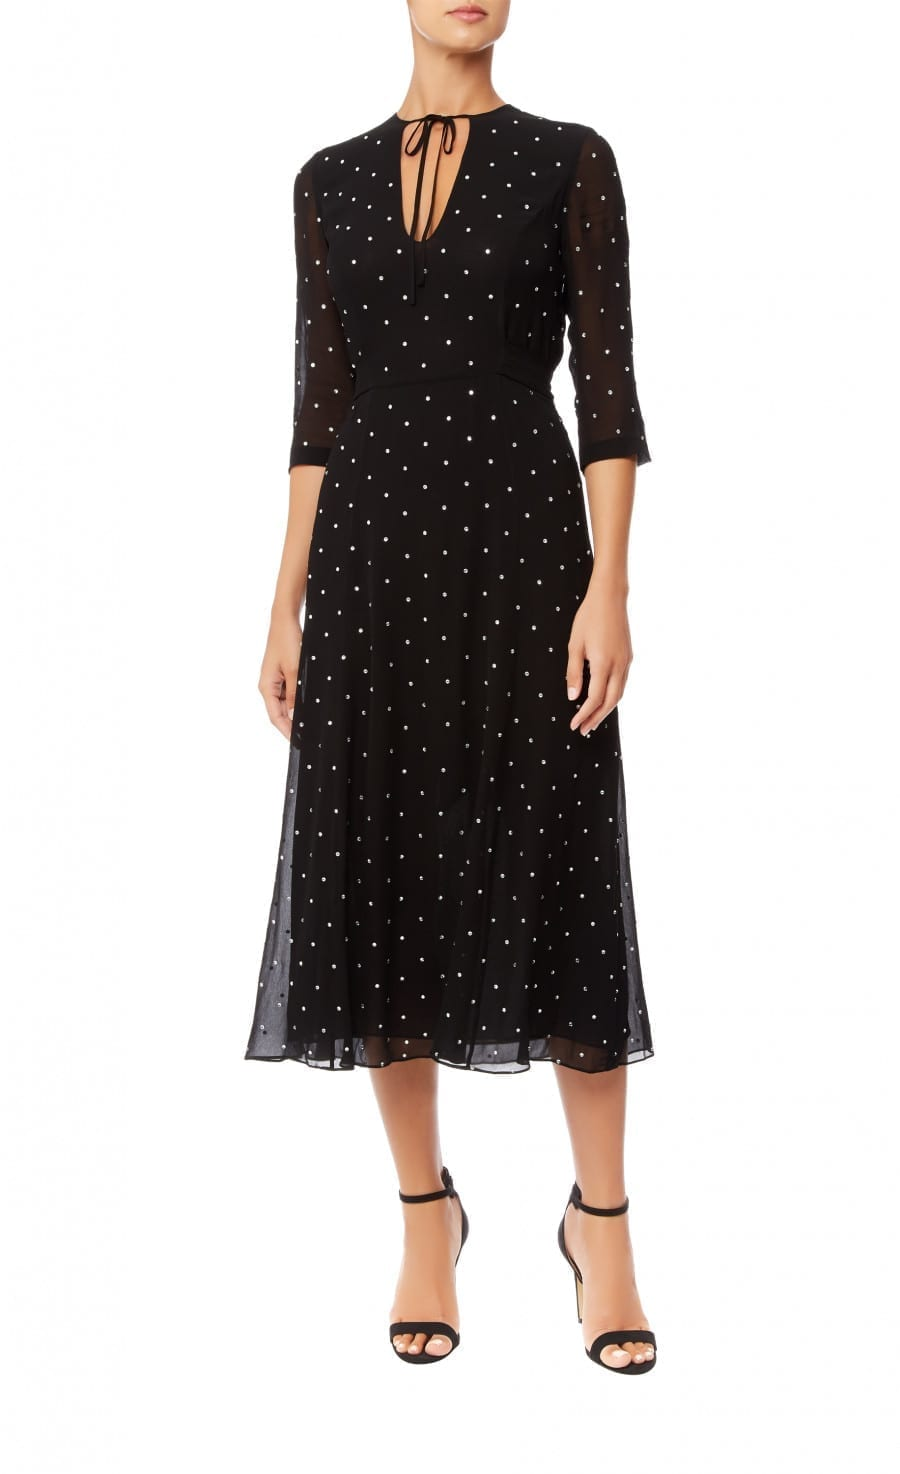 TEMPERLEY LONDON Twinkle Midi Black Dress